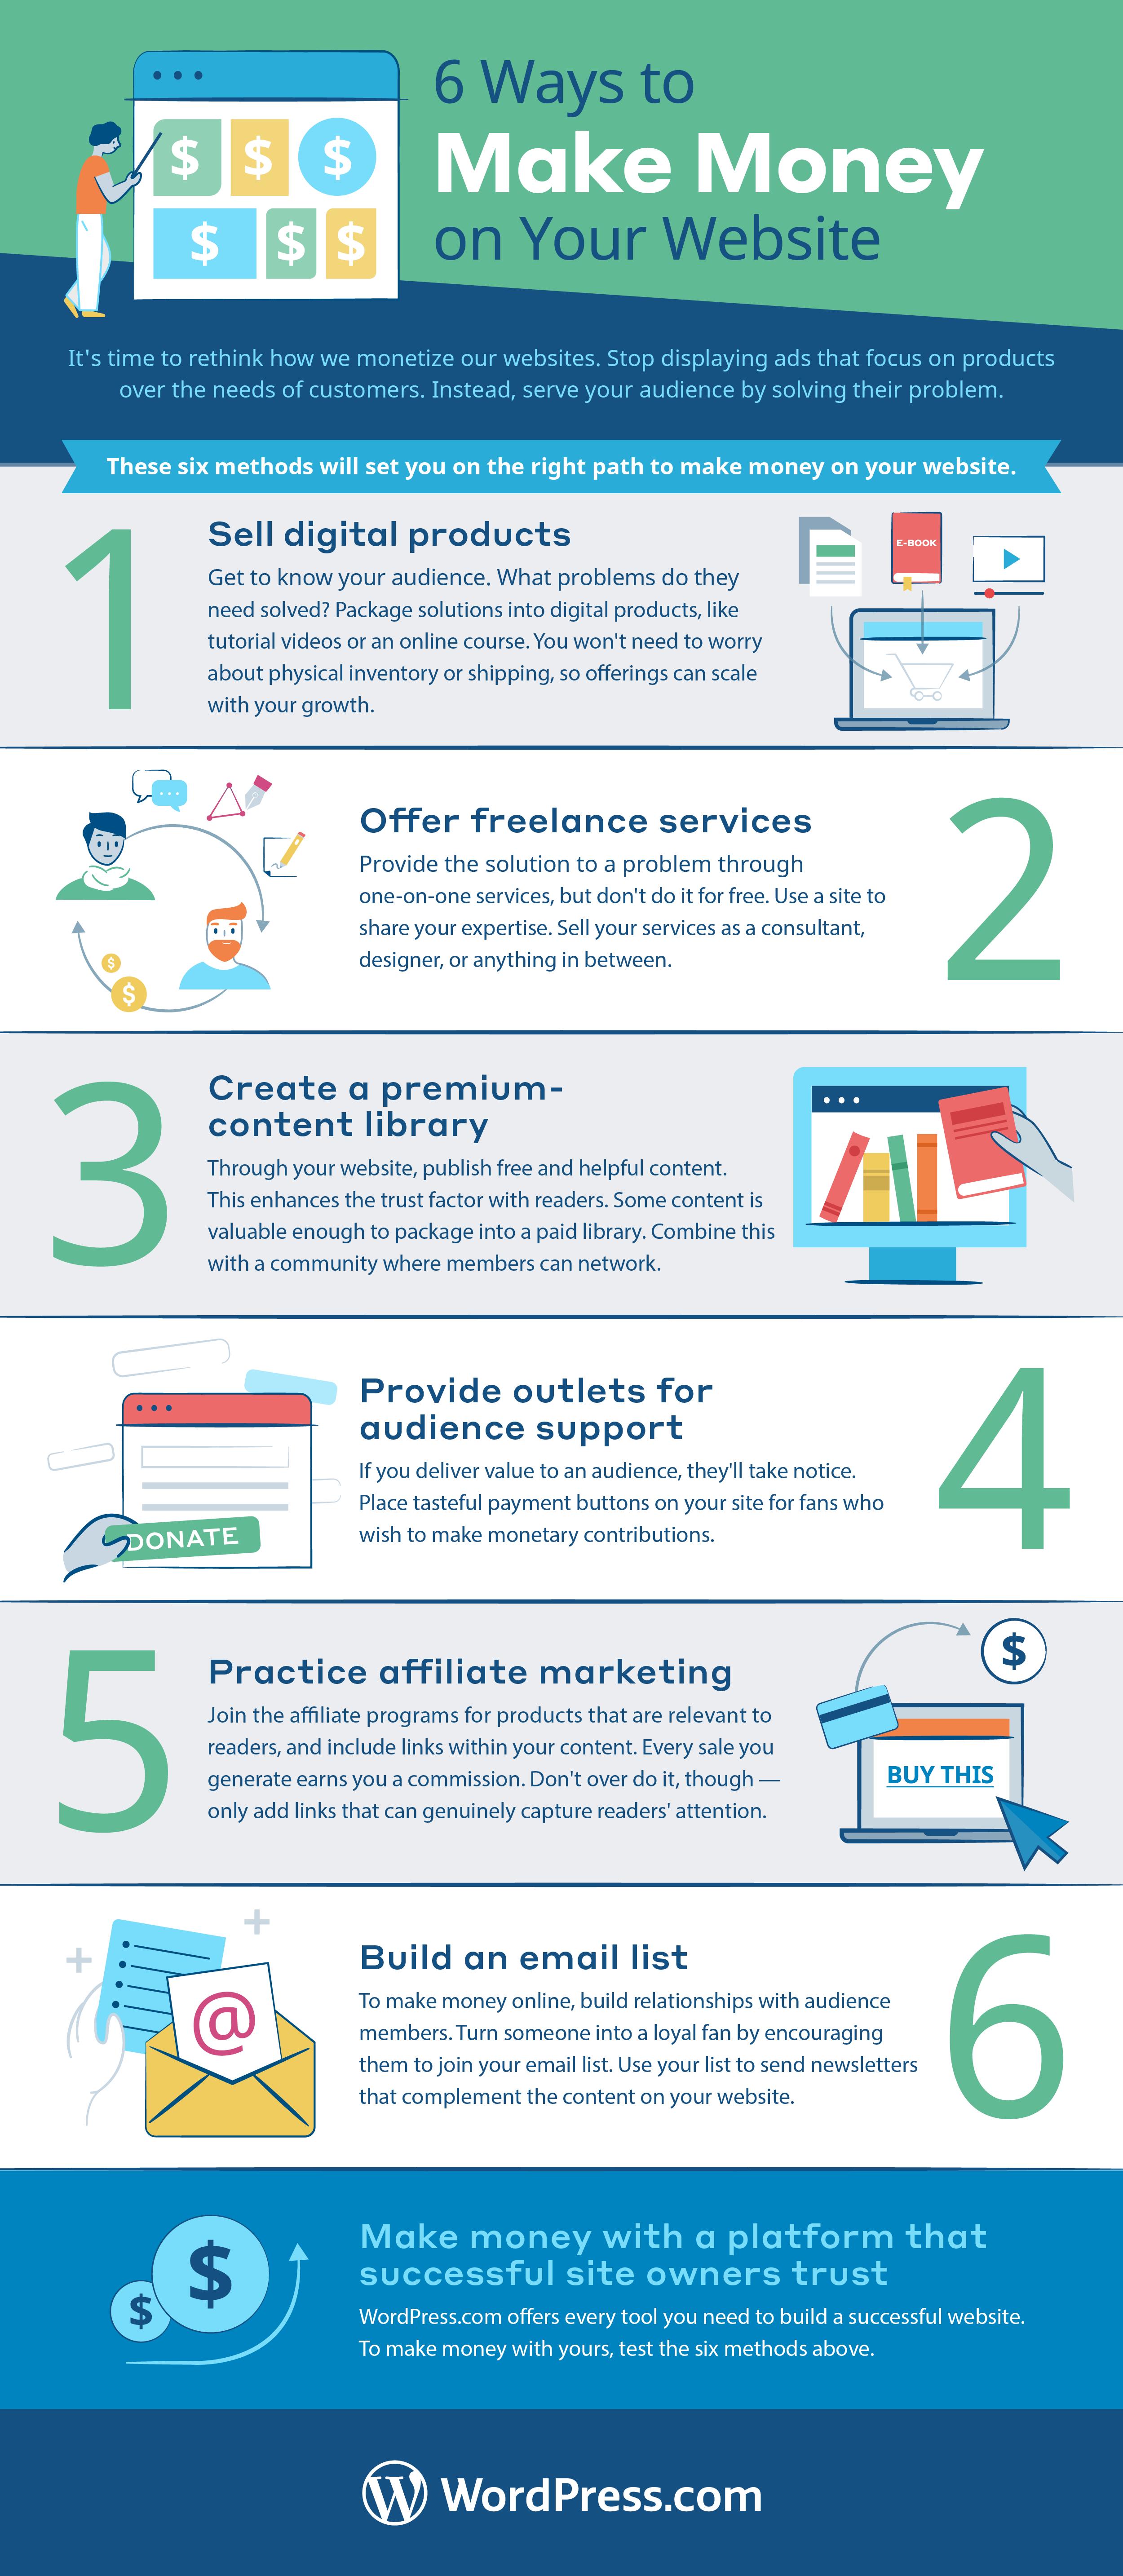 How to monetize your WordPress.com website